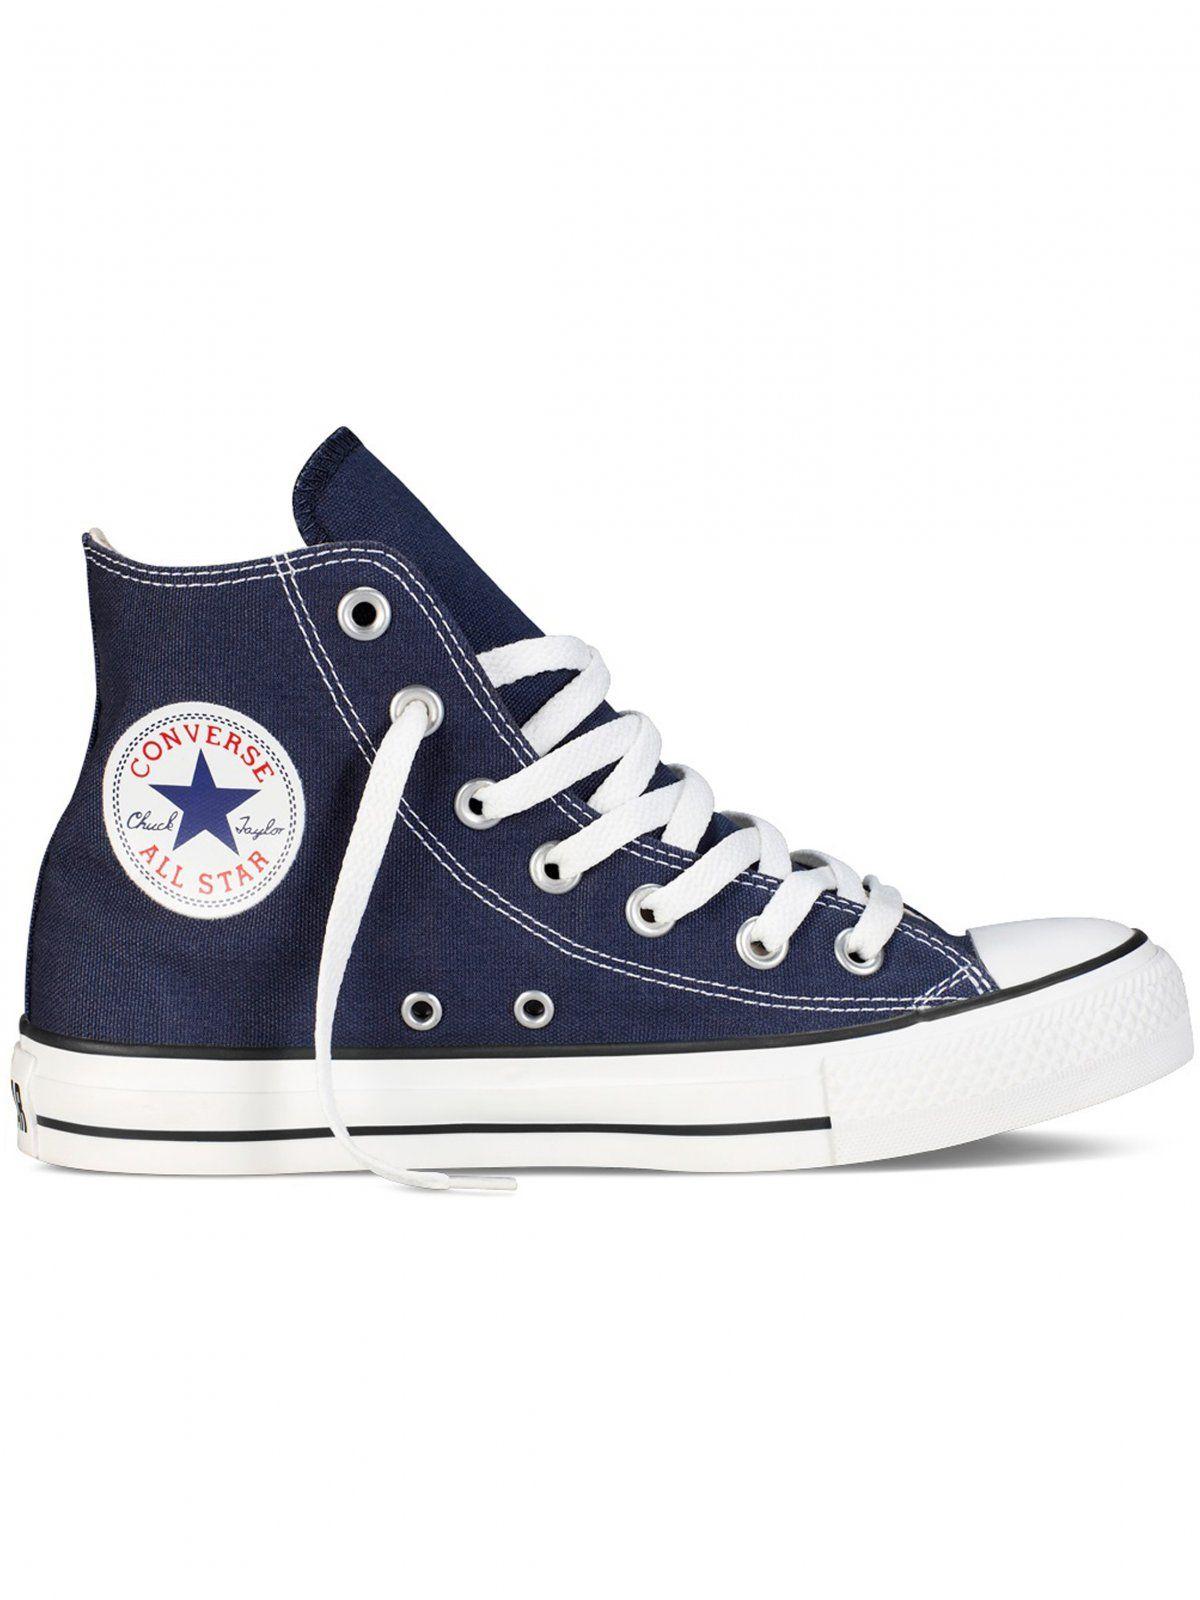 Converse All Star Unisex Chuck Taylor High Tops - Navy